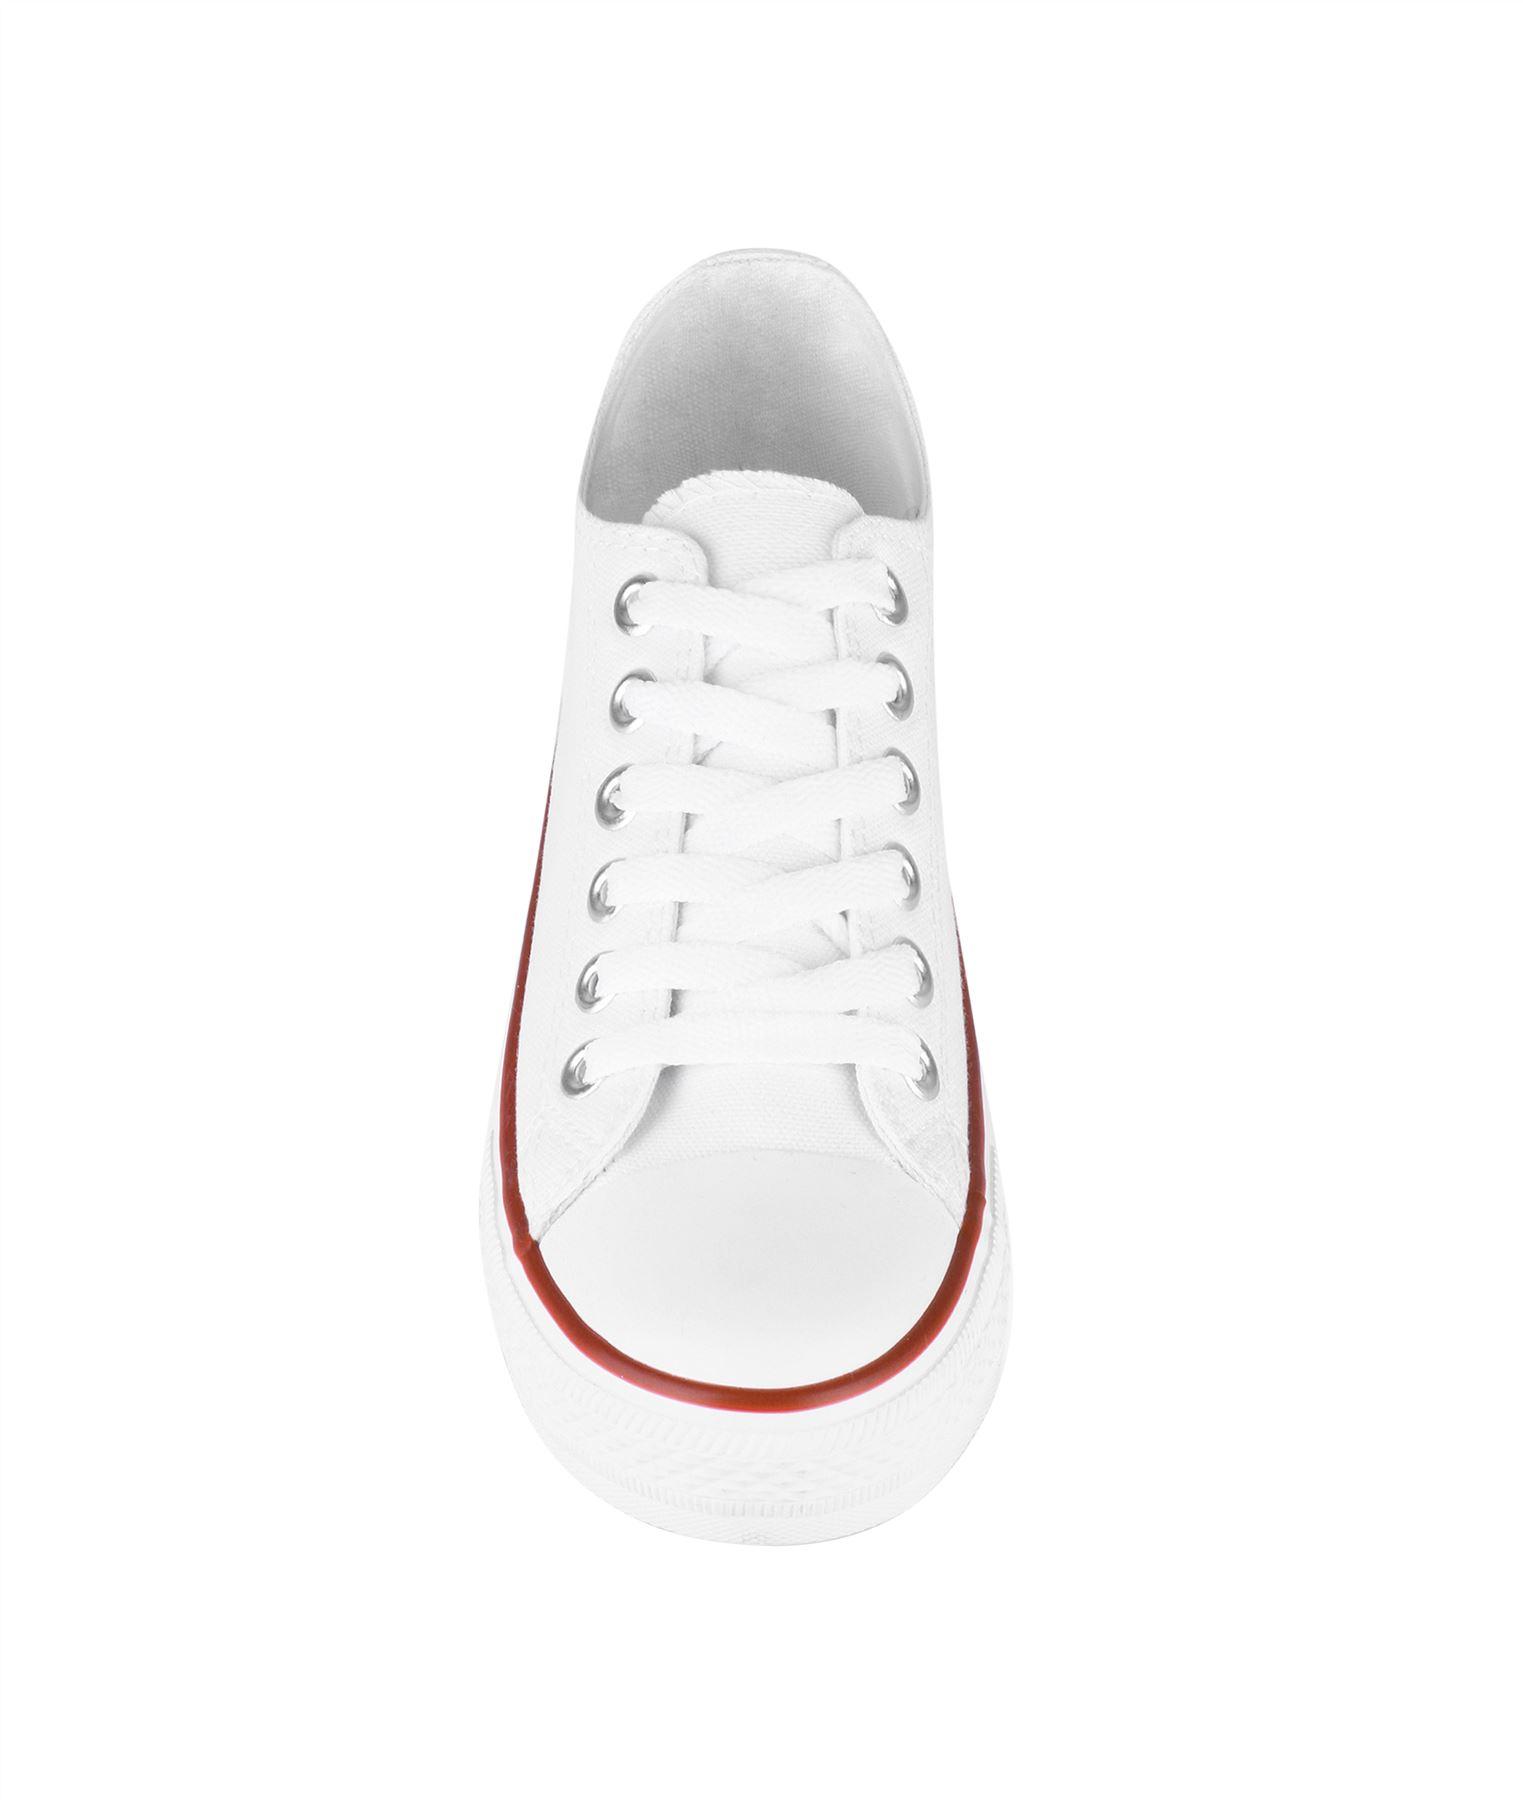 Zapatillas-Mujer-Casuales-Deportiva-Barata-Lona-Moda-Originales-Outlet-Tela-Moda miniatura 9